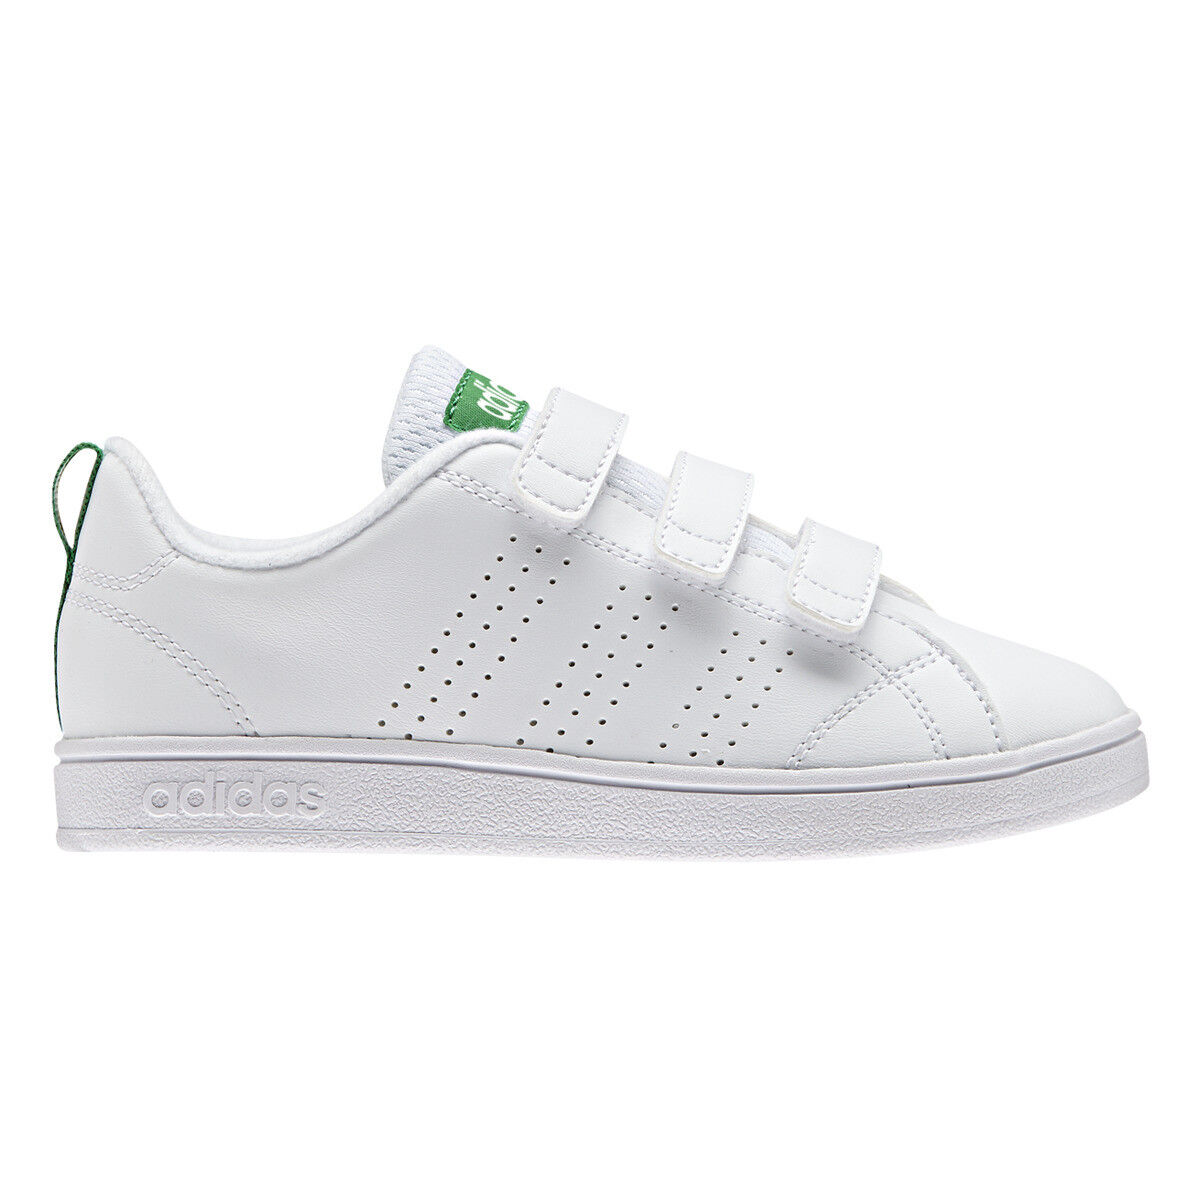 designer fashion 4ed5a f6e8a Shoes adidas VS Advantage Clean CMF C Size 35 Aw4880 White f